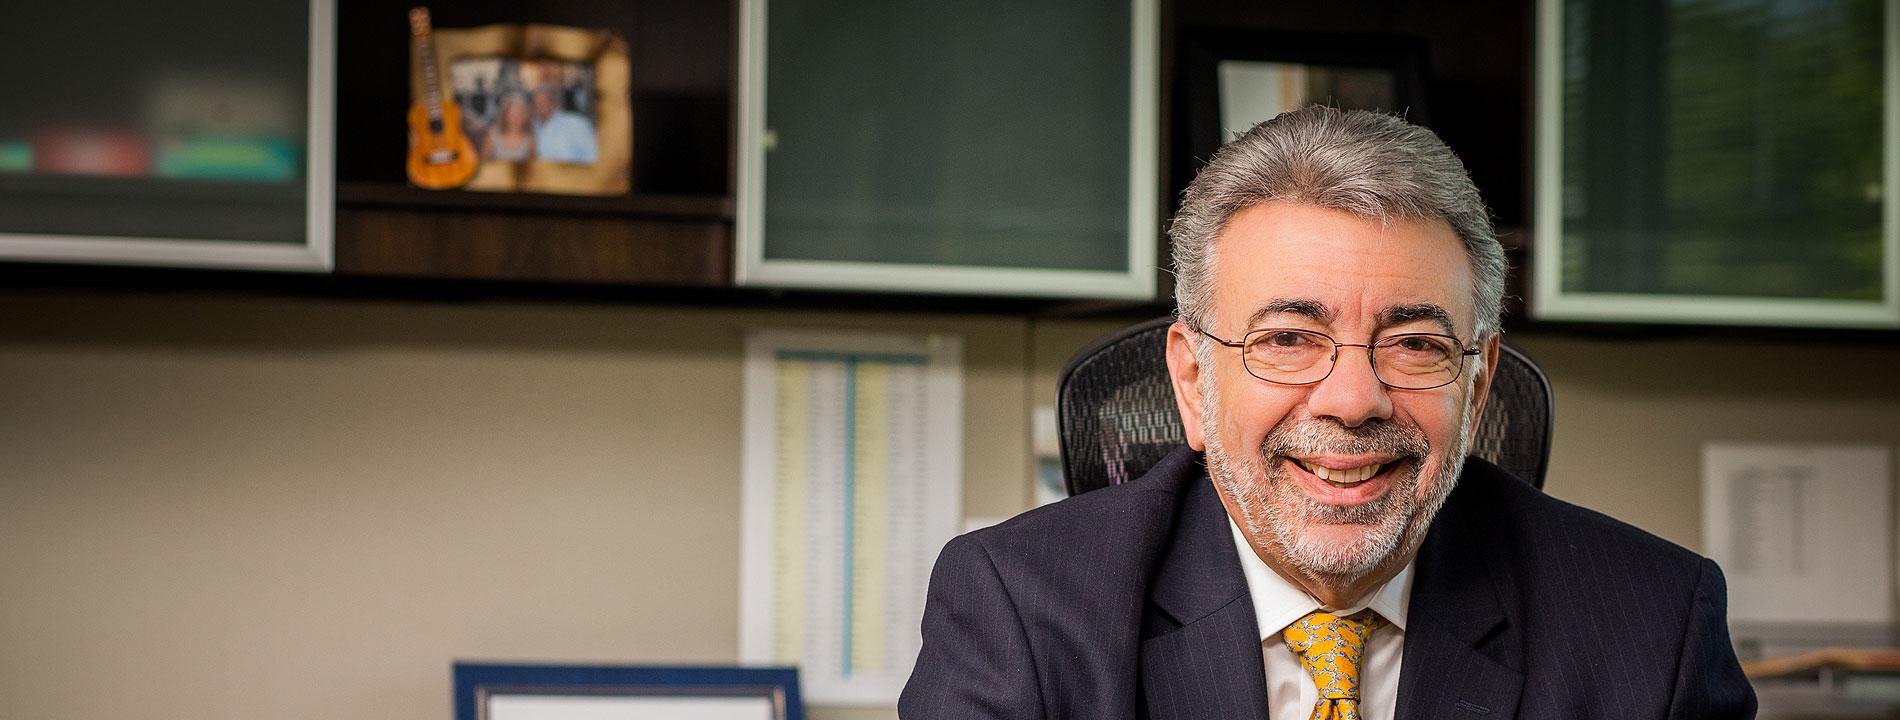 Anthony J. Vitullo, CPA, CGMA